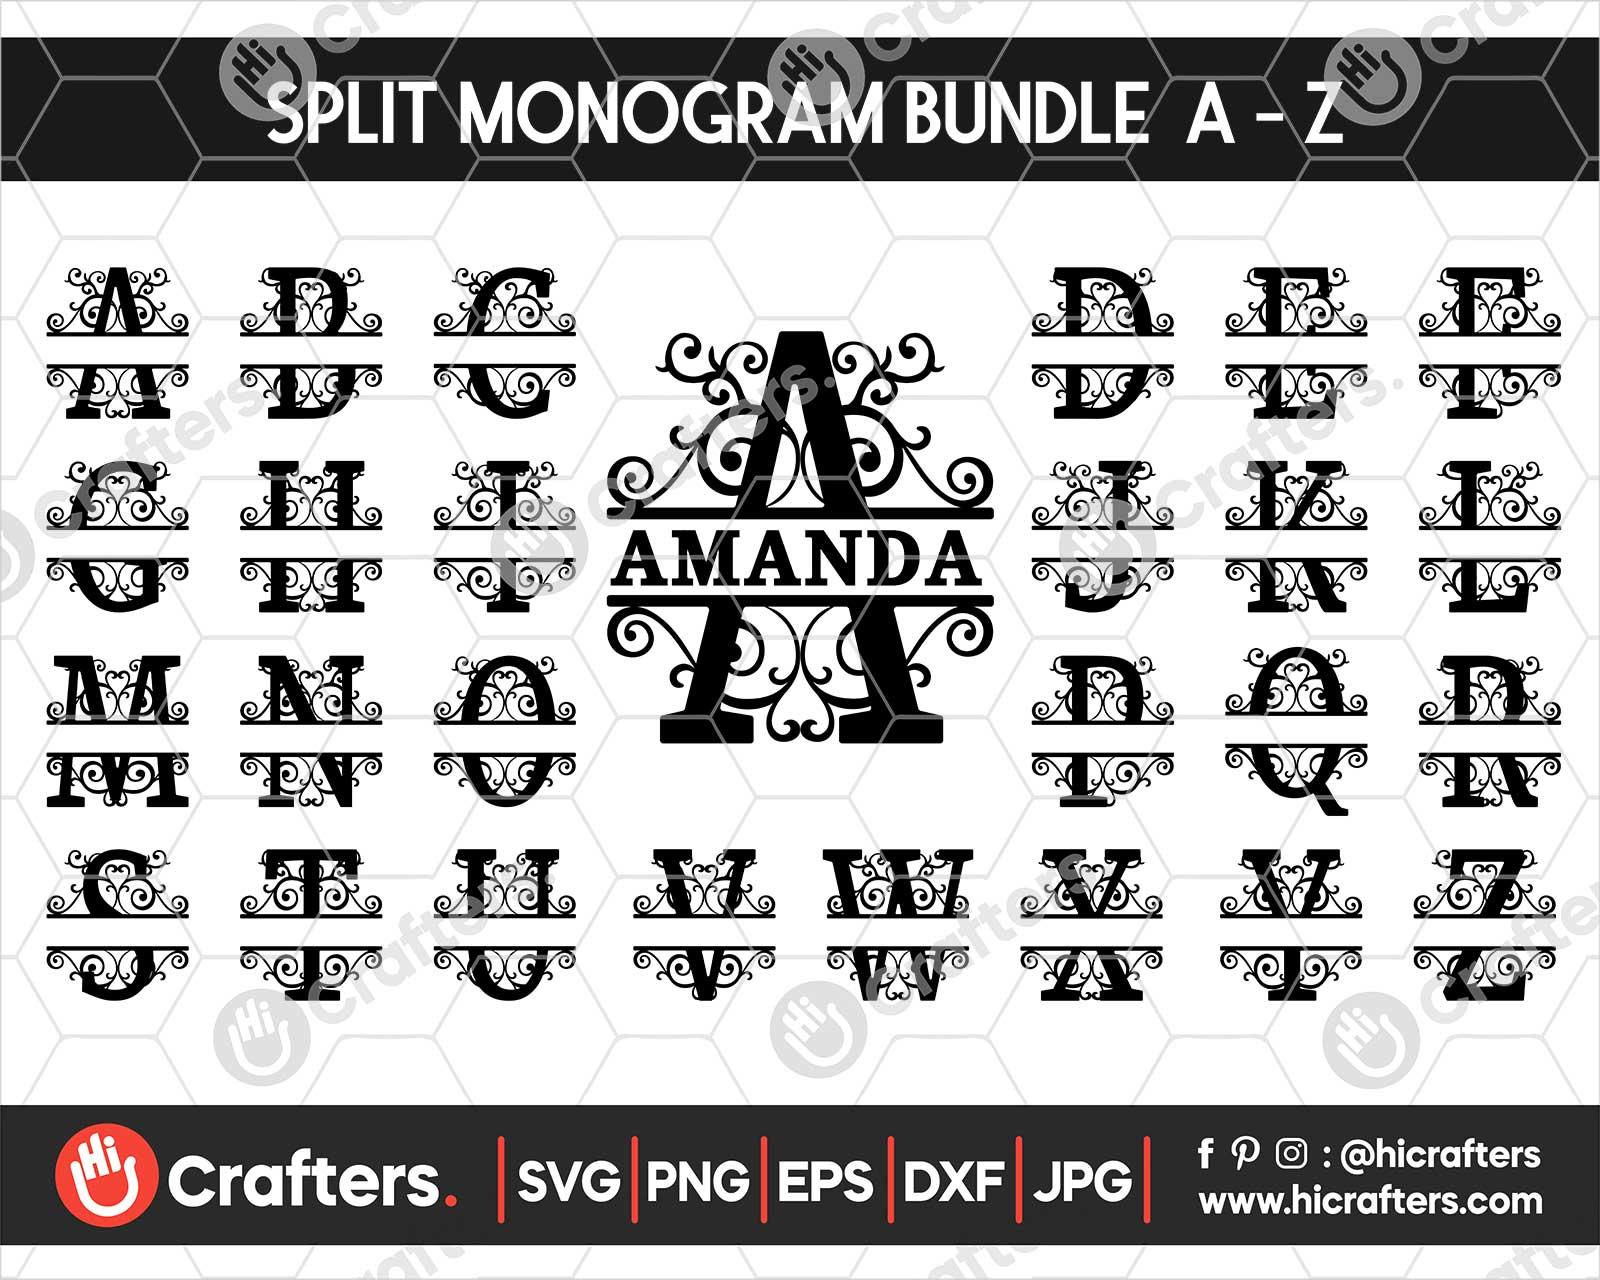 Split Monogram Letters Svg Files For Cricut Hi Crafters